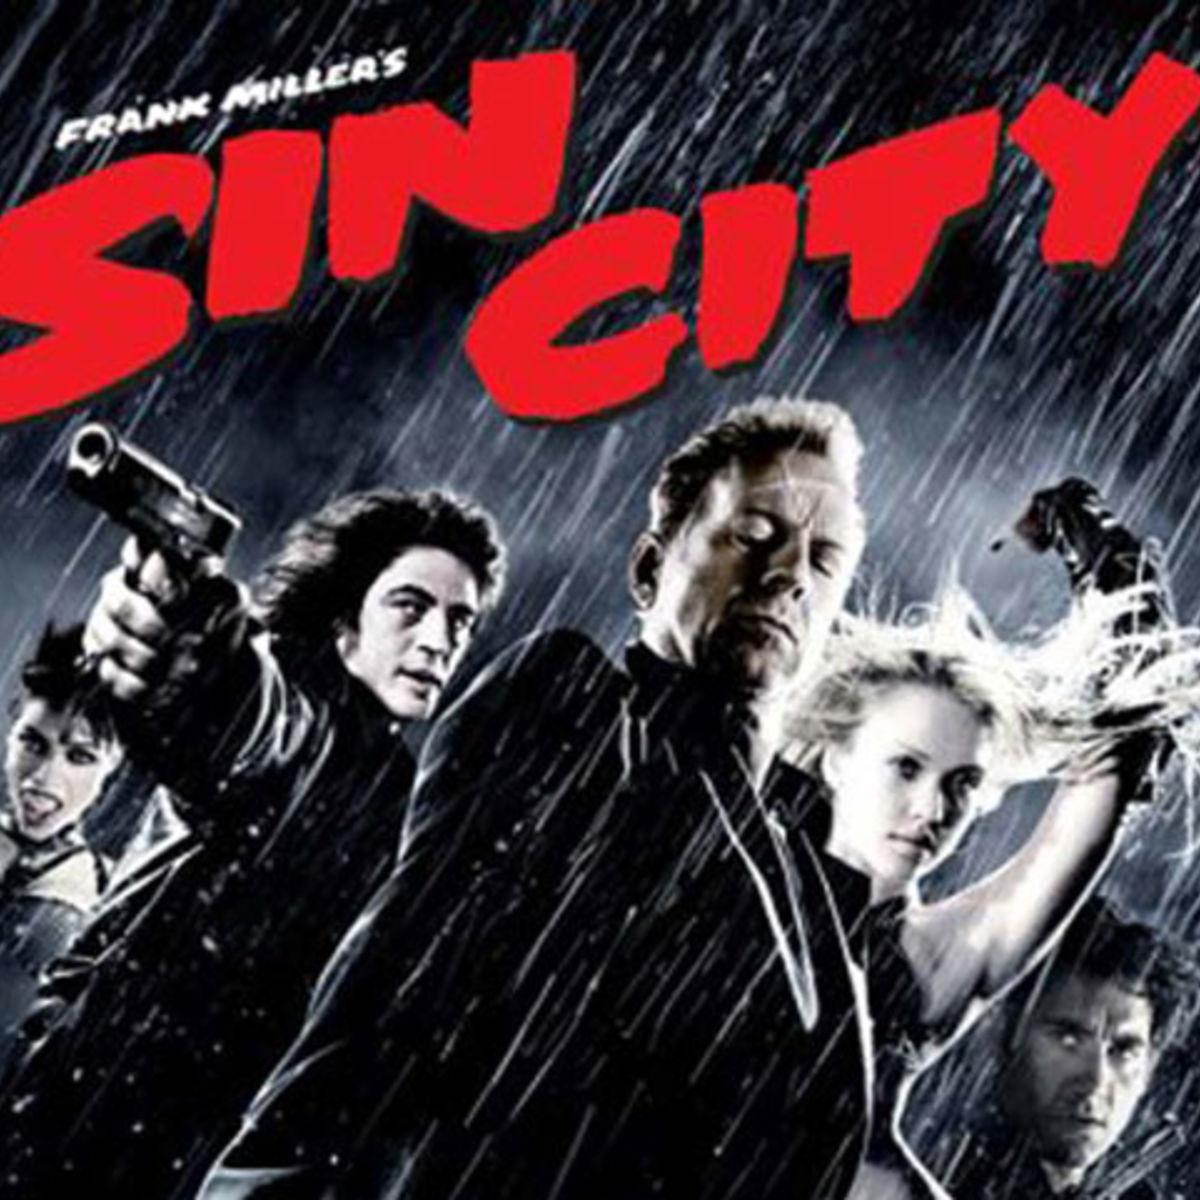 SinCity031412.jpg